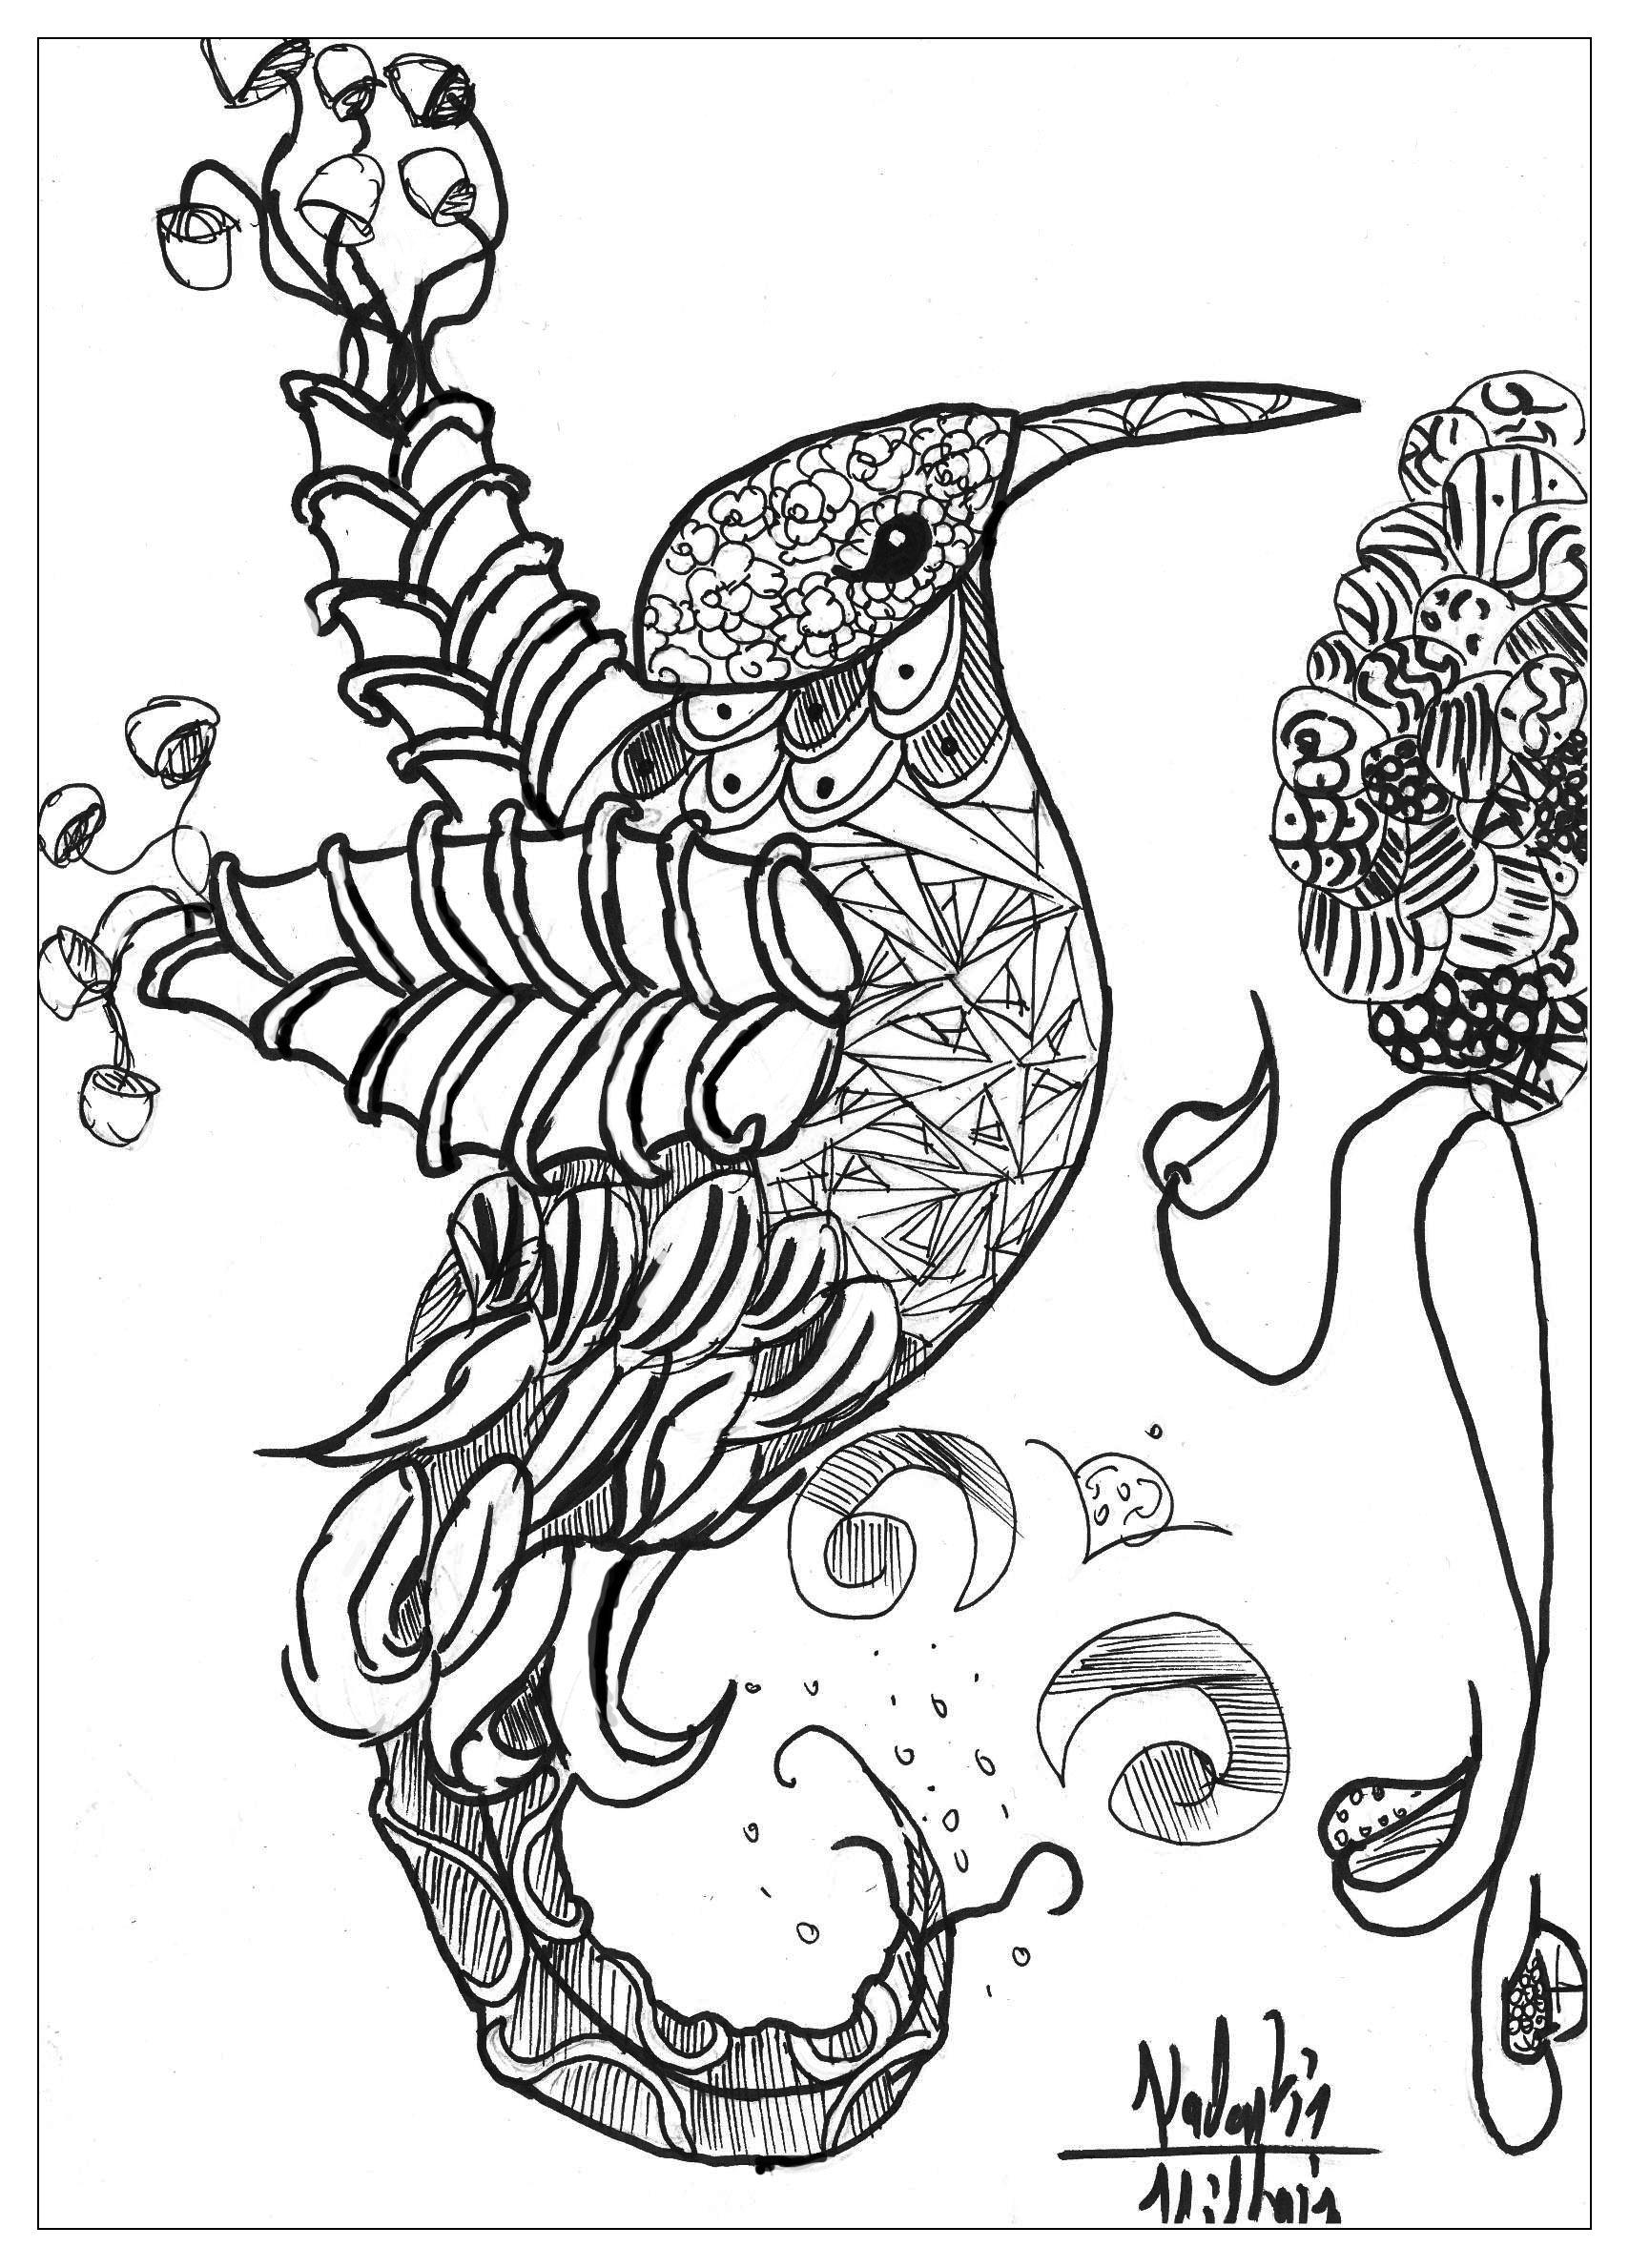 Malbuch Fur Erwachsene  : Vögel - 13